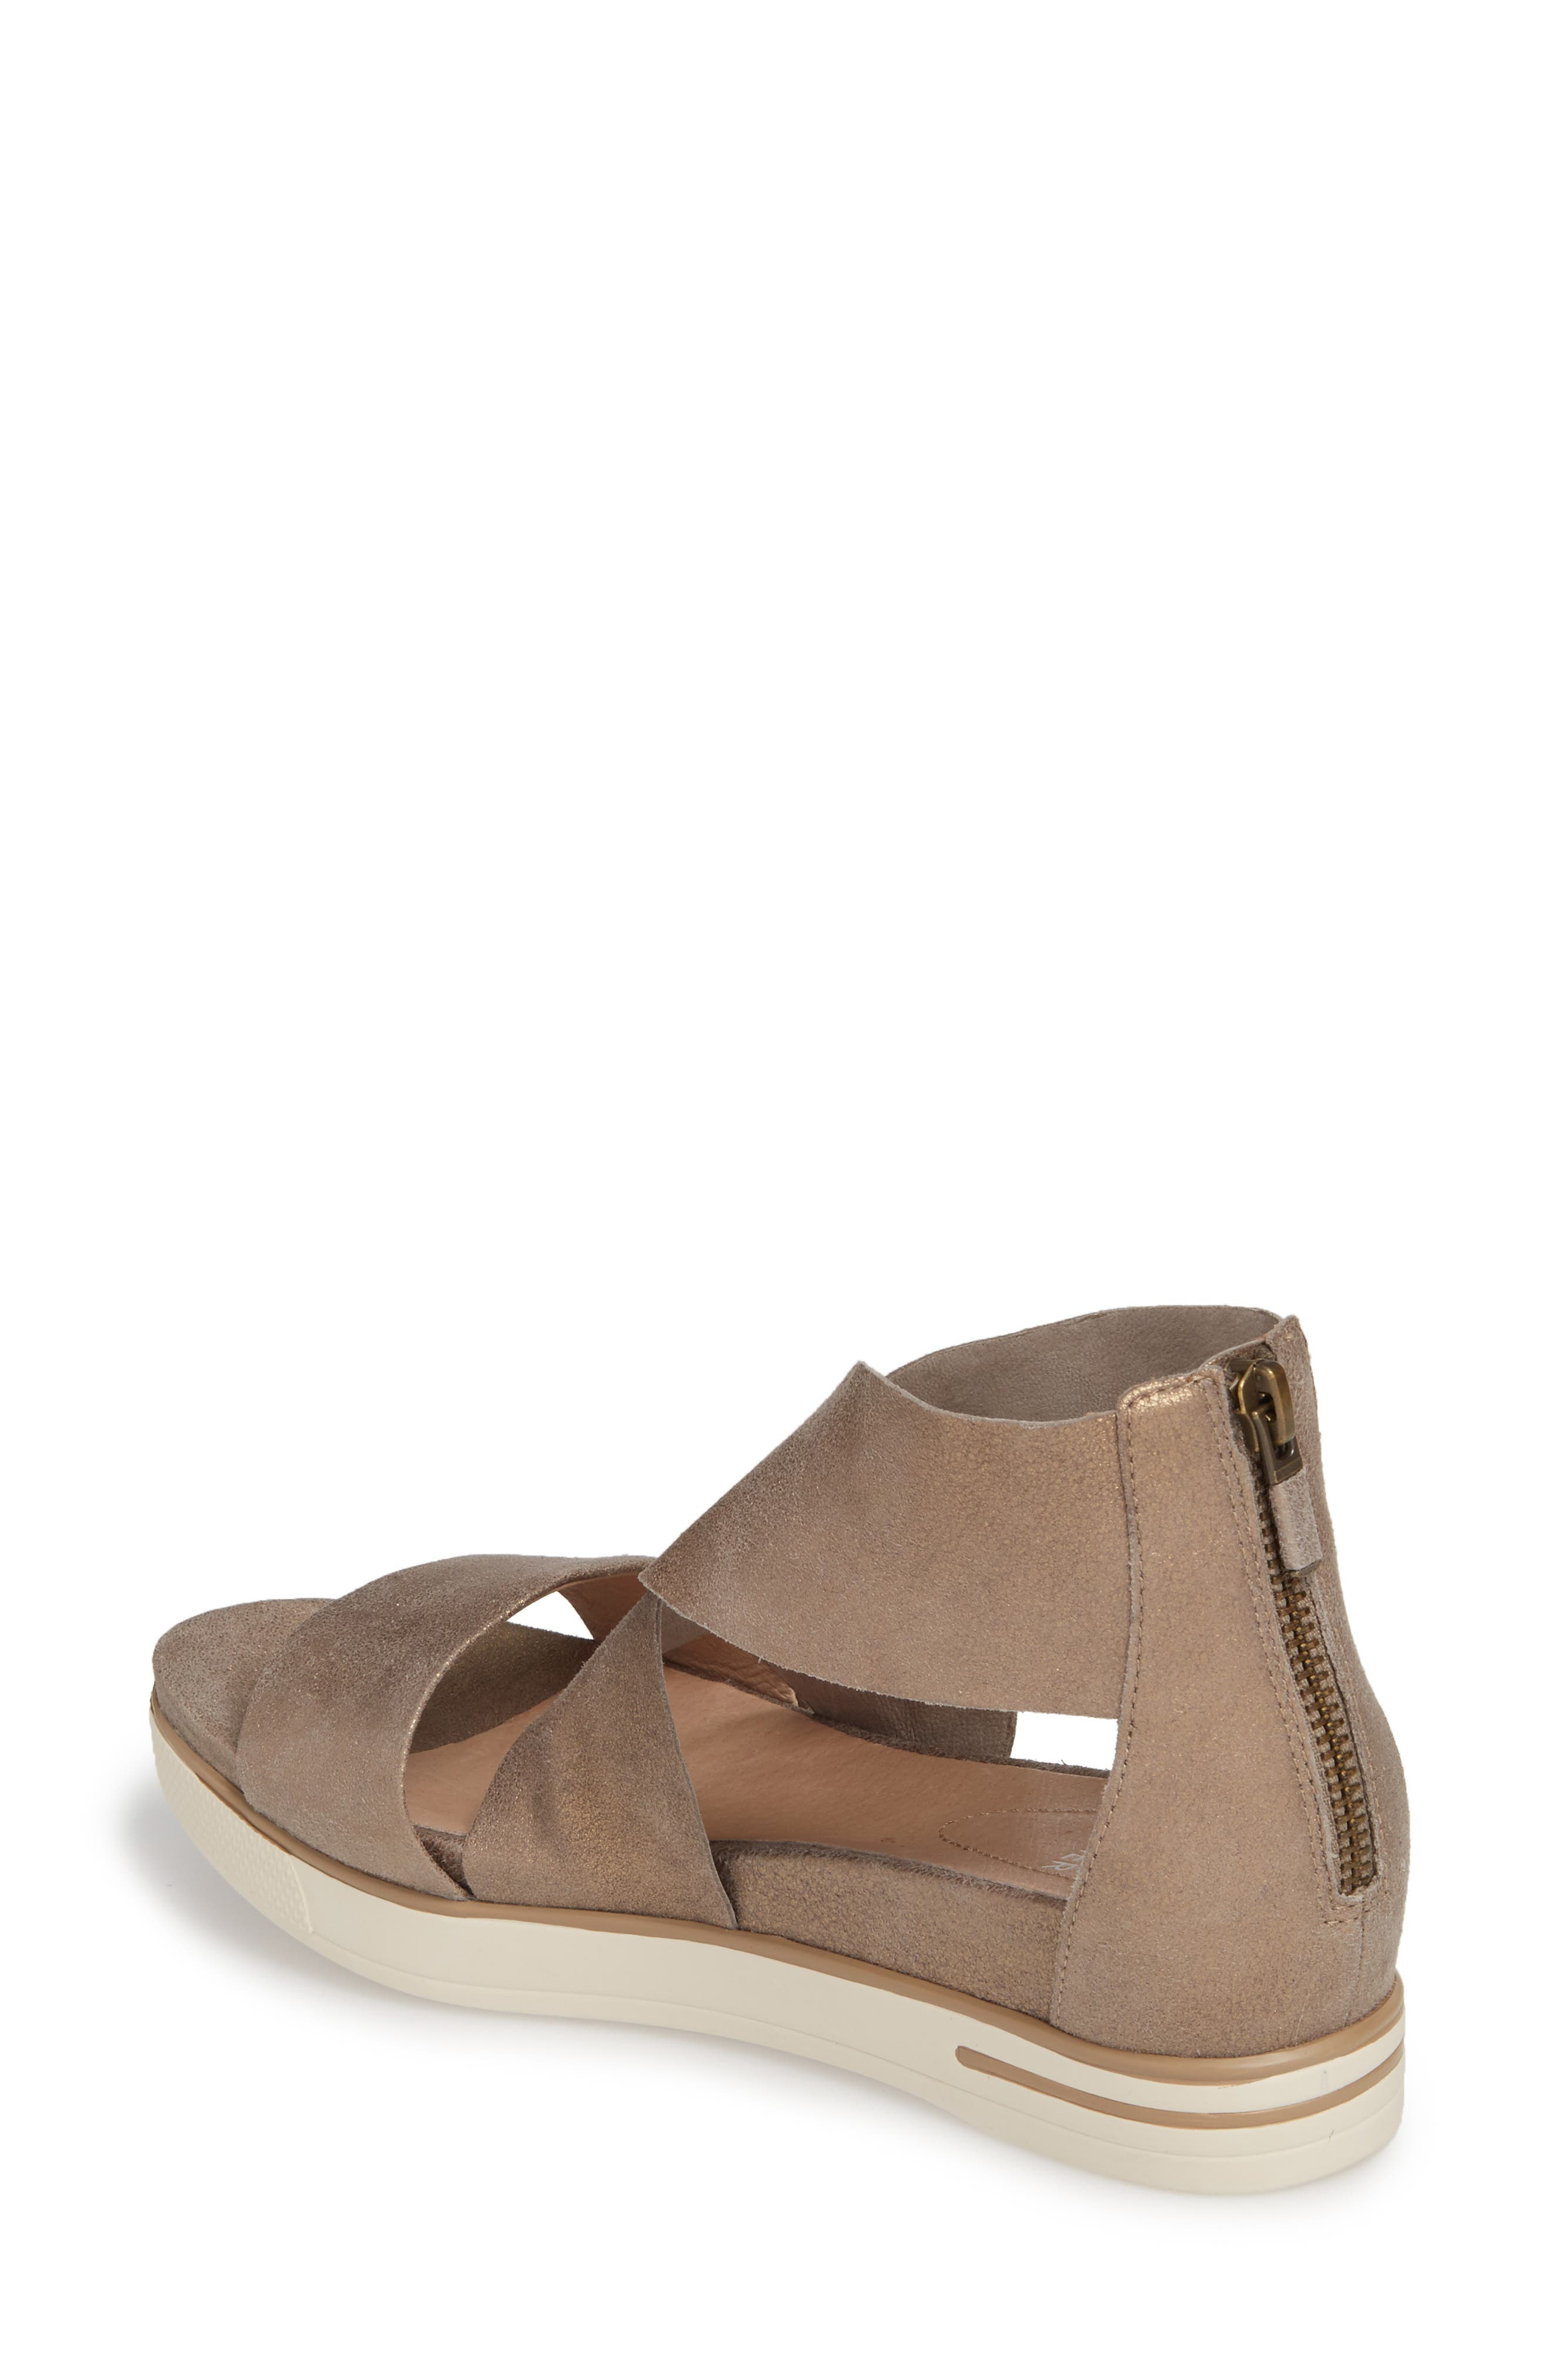 Sport Platform Sandal,                             Alternate thumbnail 2, color,                             PLATINUM LEATHER